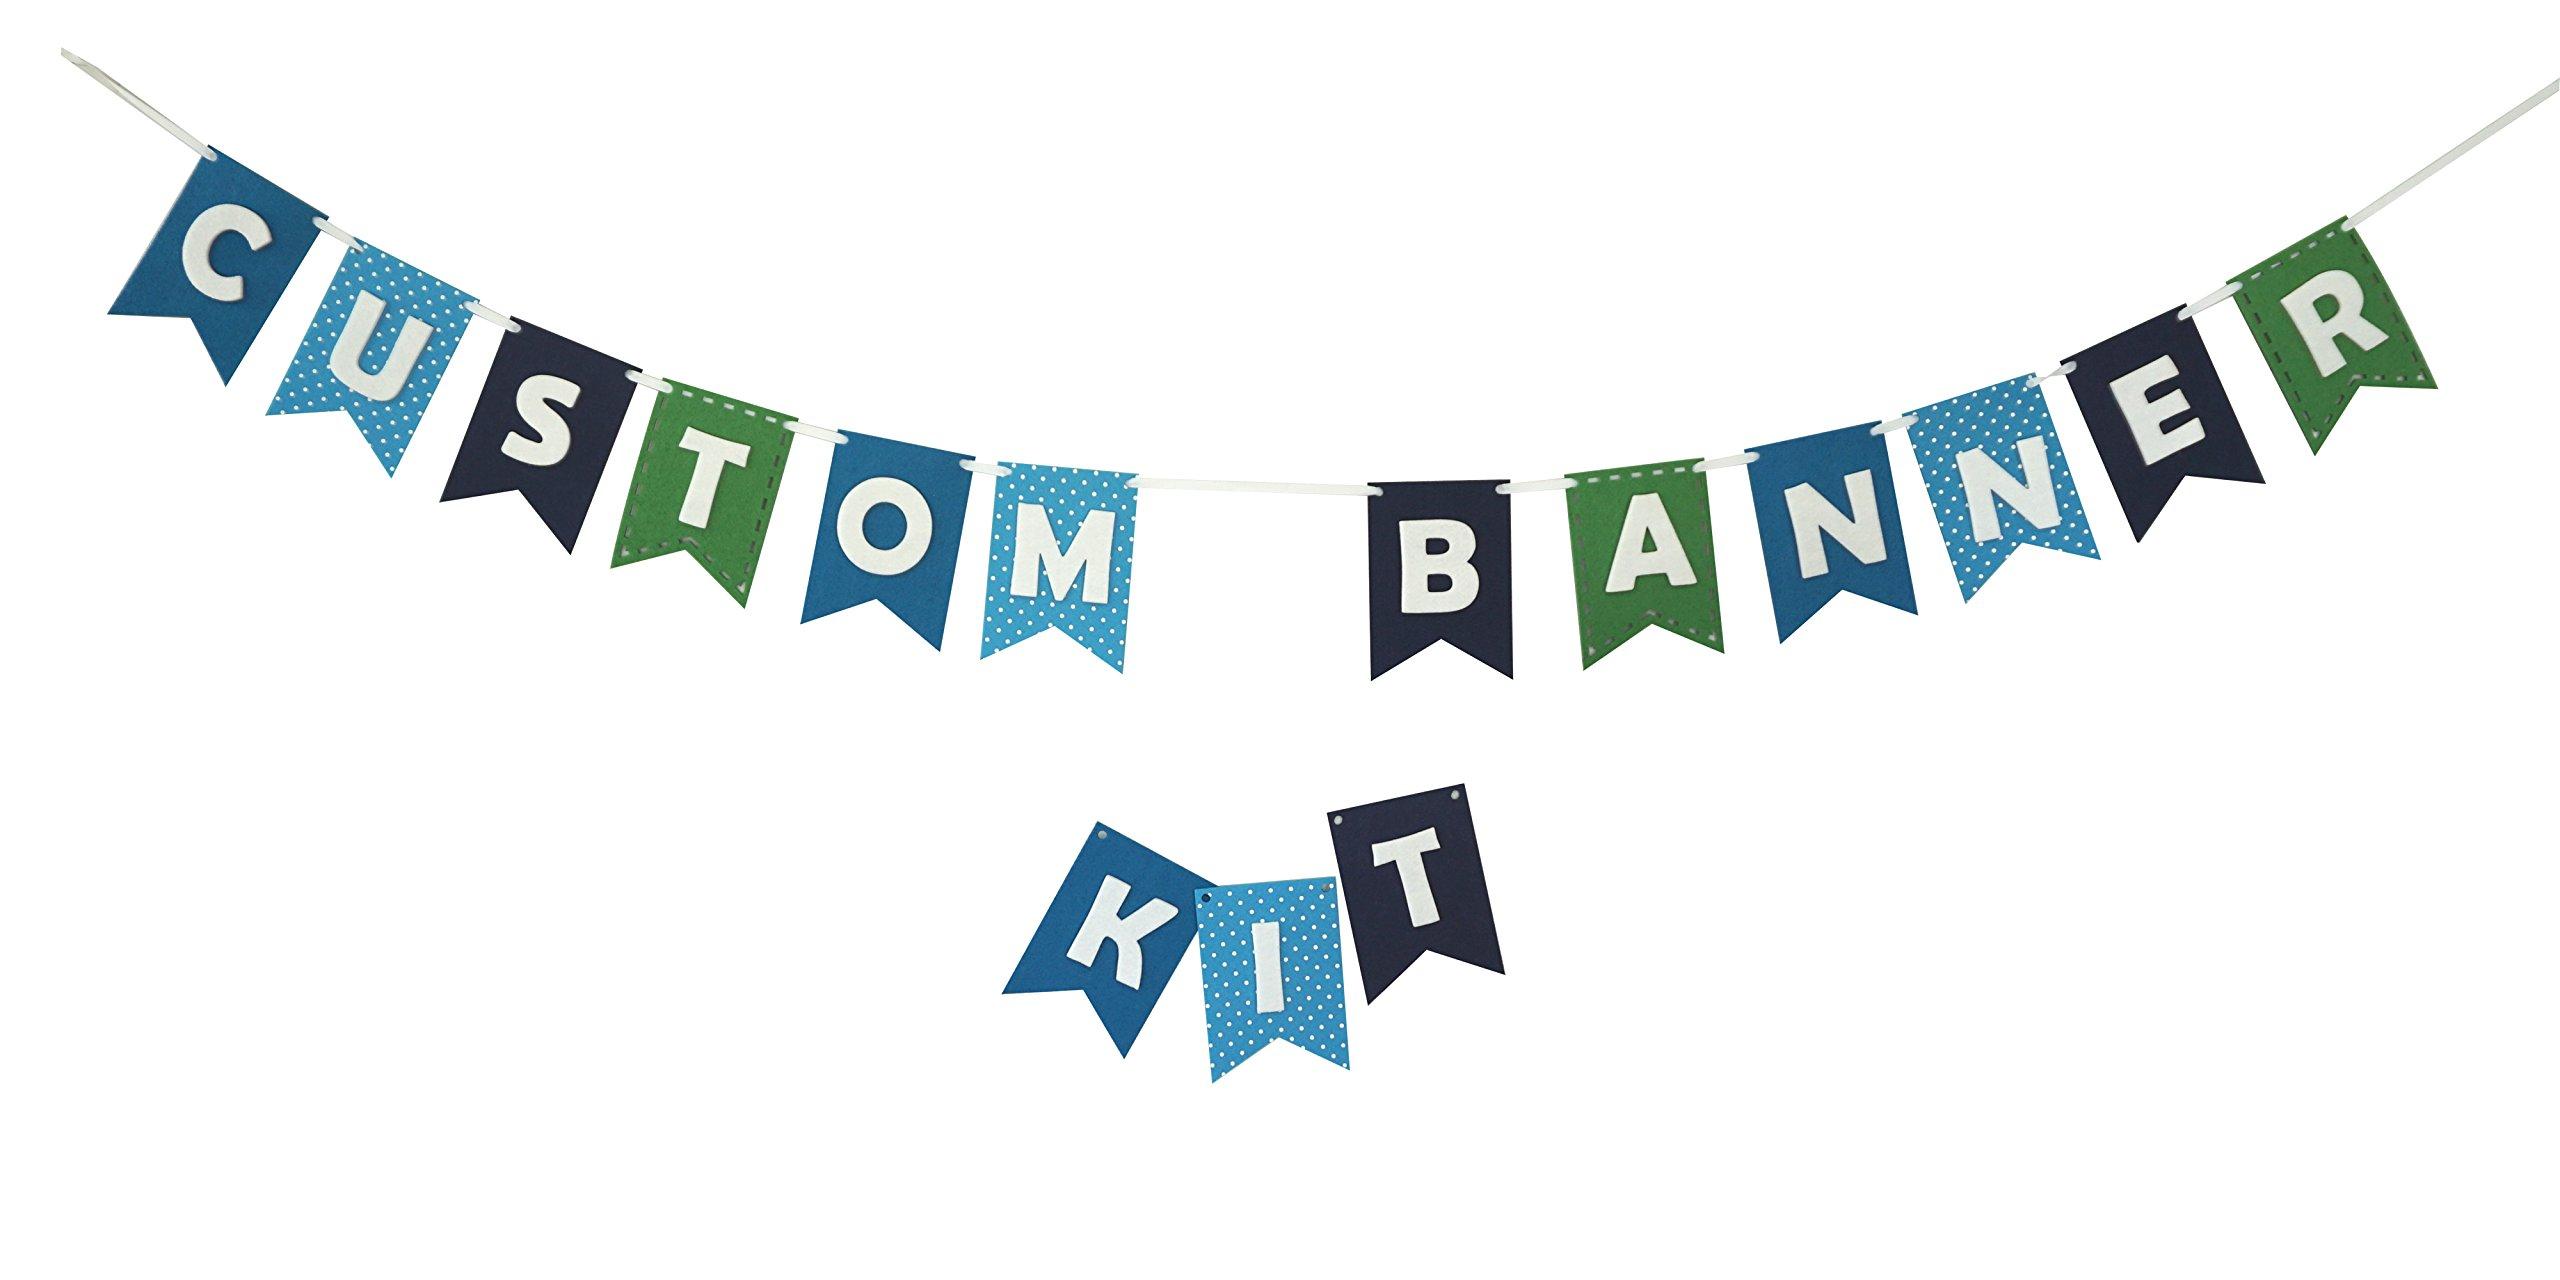 Custom Banner Kit Bunting Laser Cut Felt & Letters Customizable Length - Blues